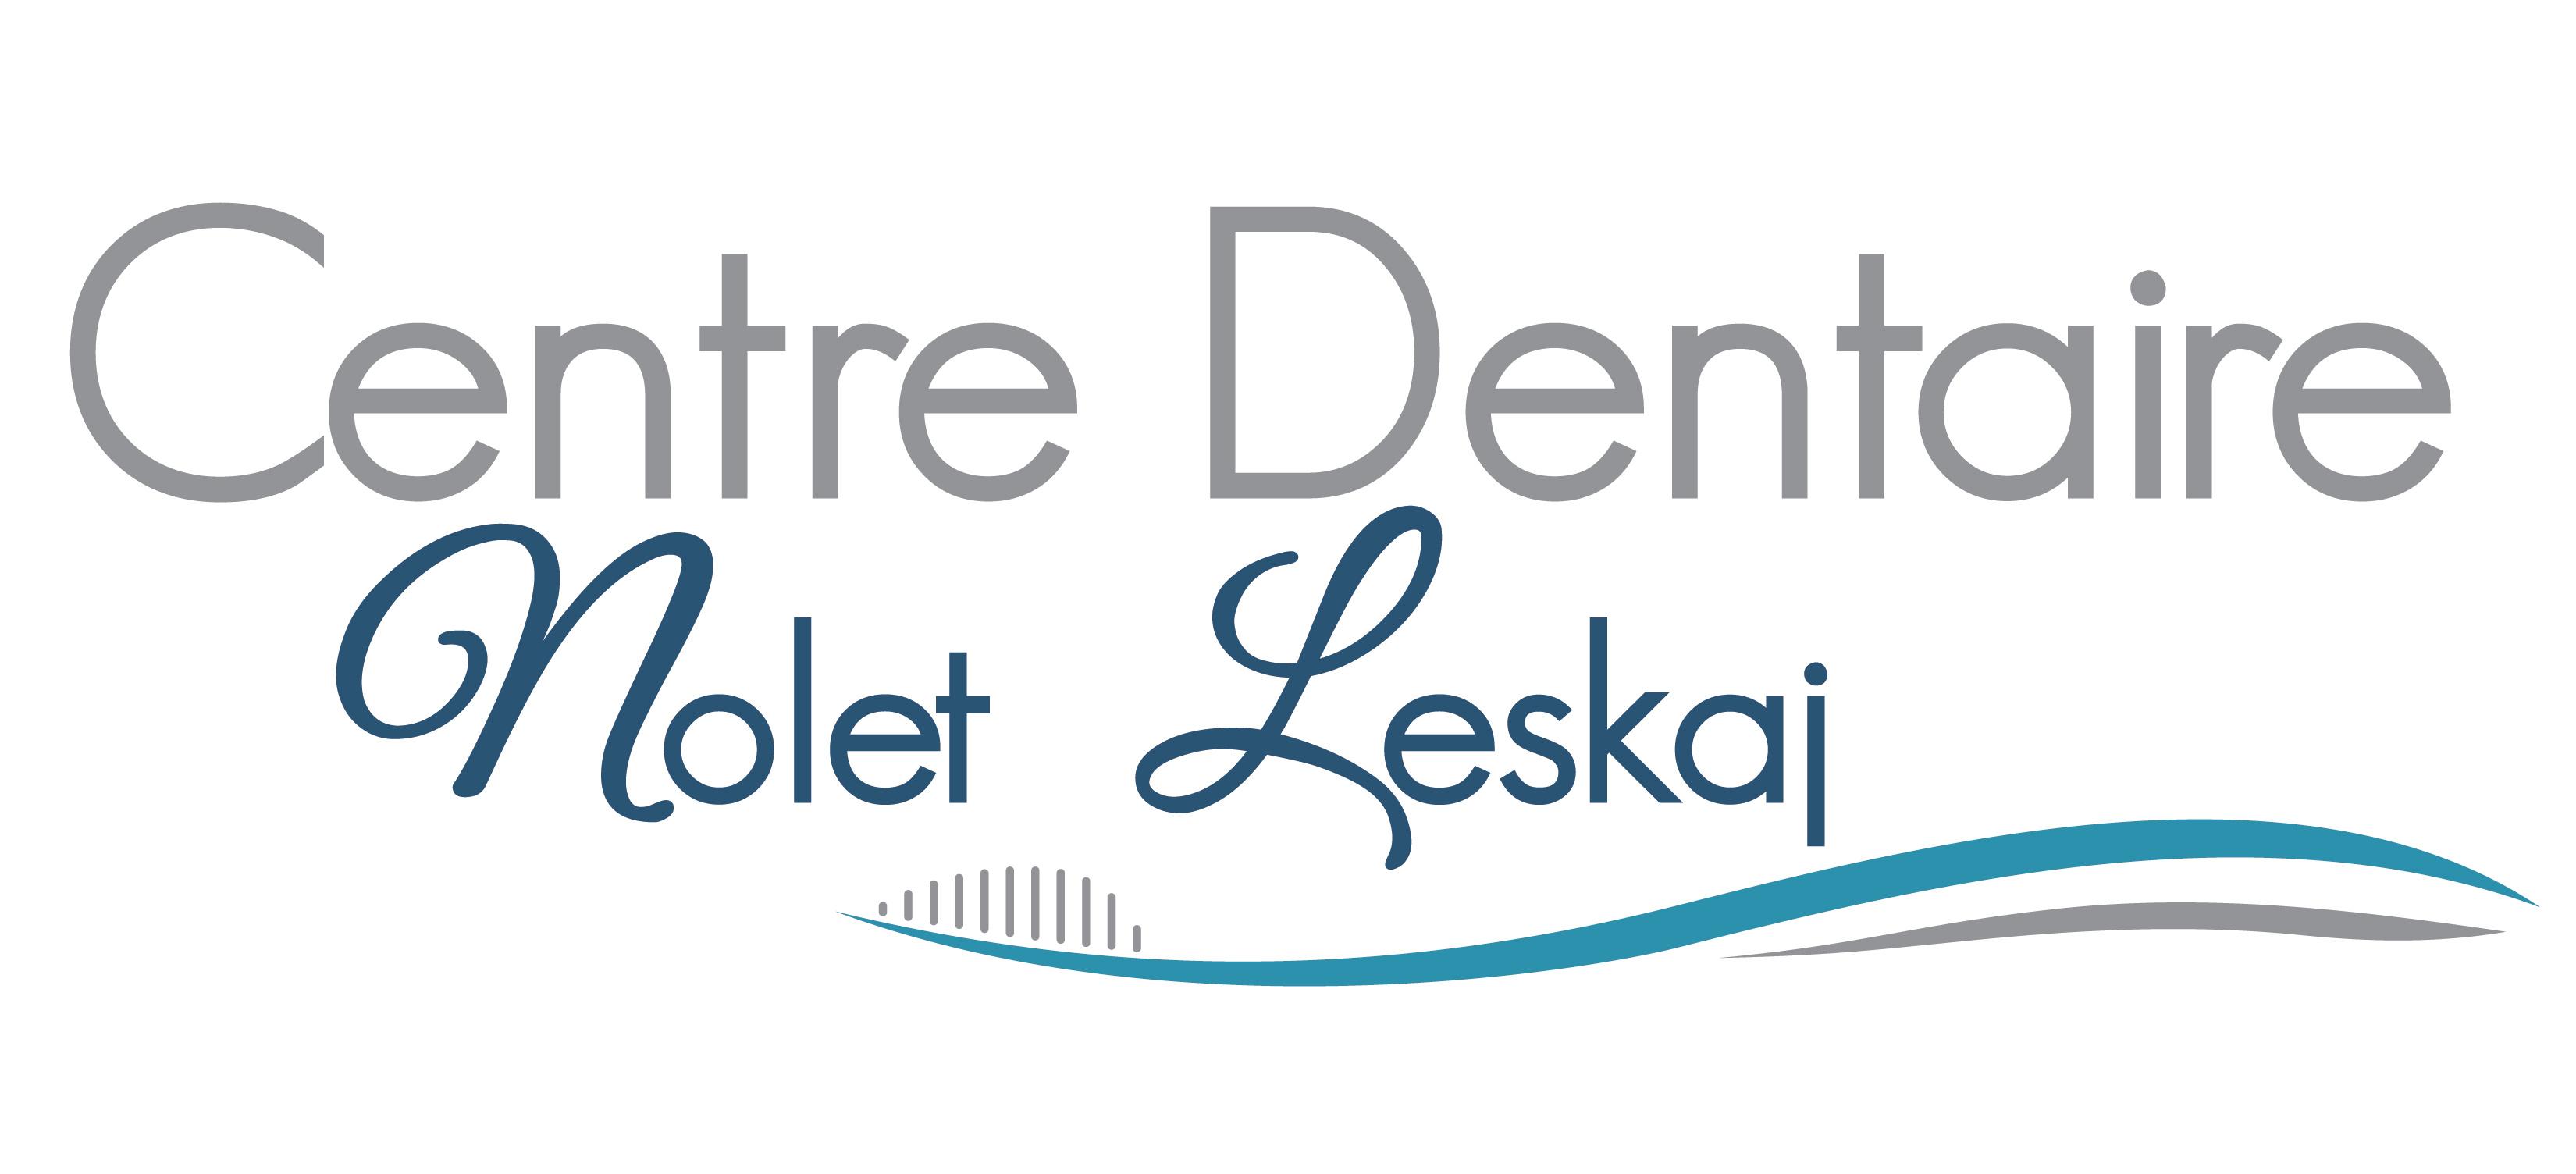 Dentiste Nolet_leskaj_LOGO couleurs_Janv